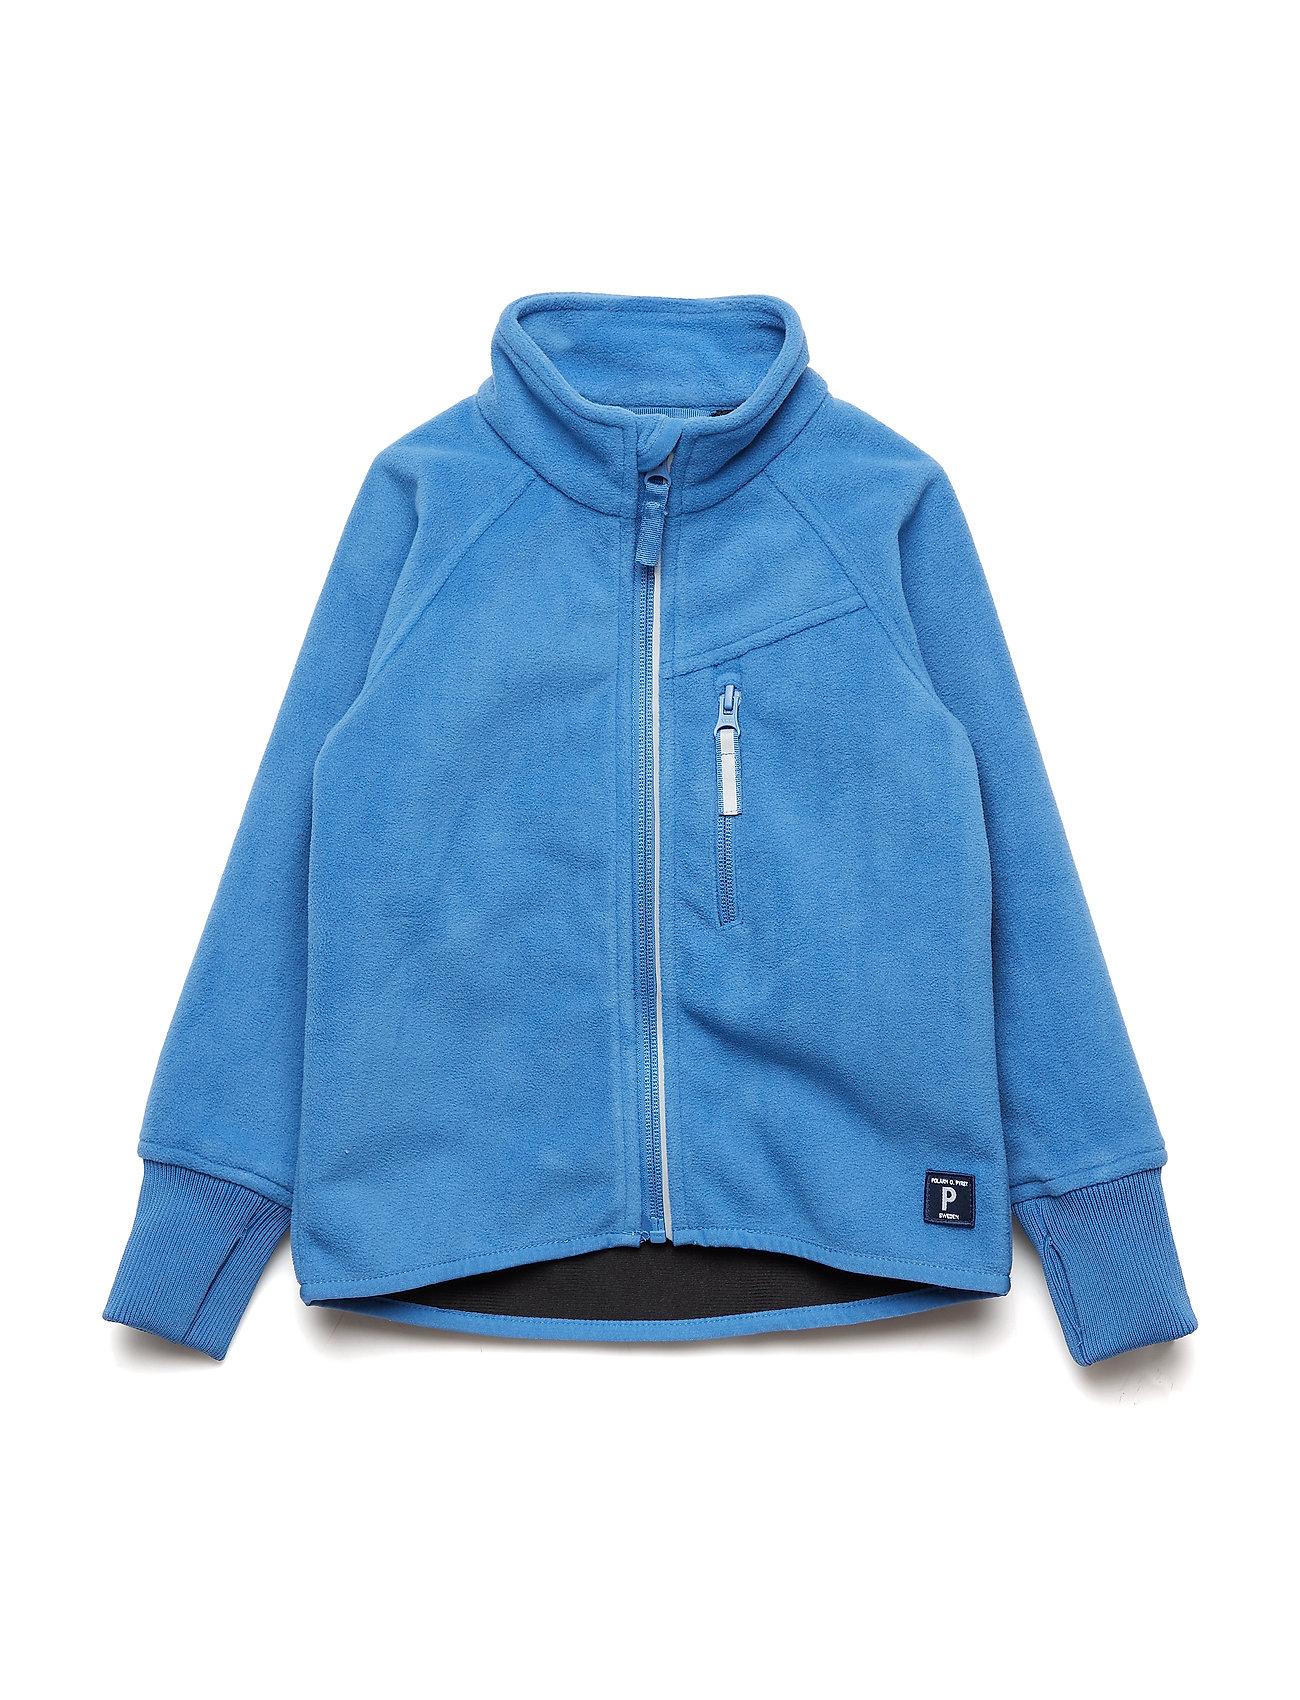 Polarn O. Pyret Windproof Fleece Jacket